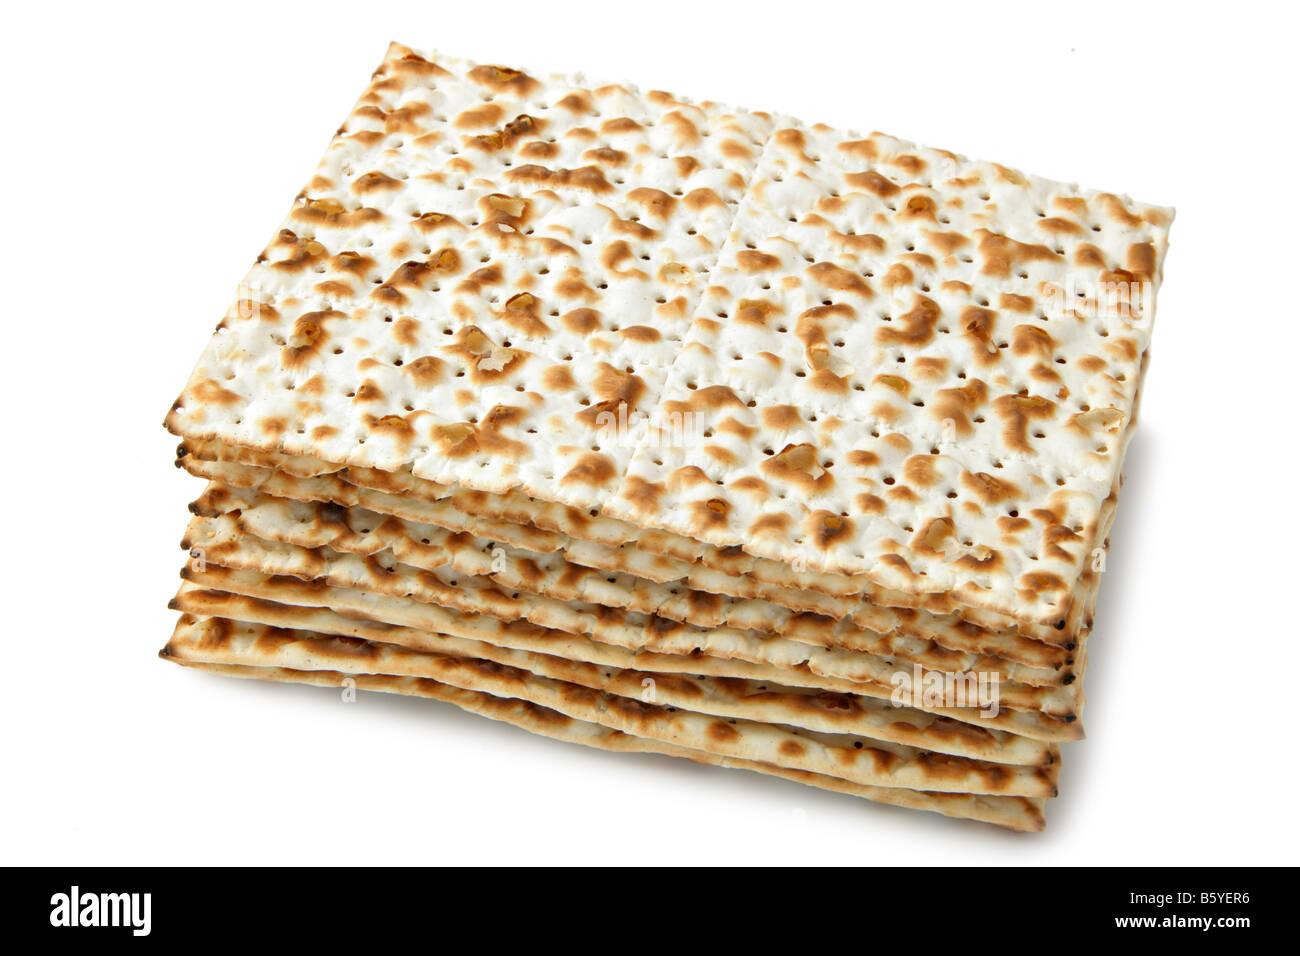 Matzos jewish passover bread isolated over white background - Stock Image